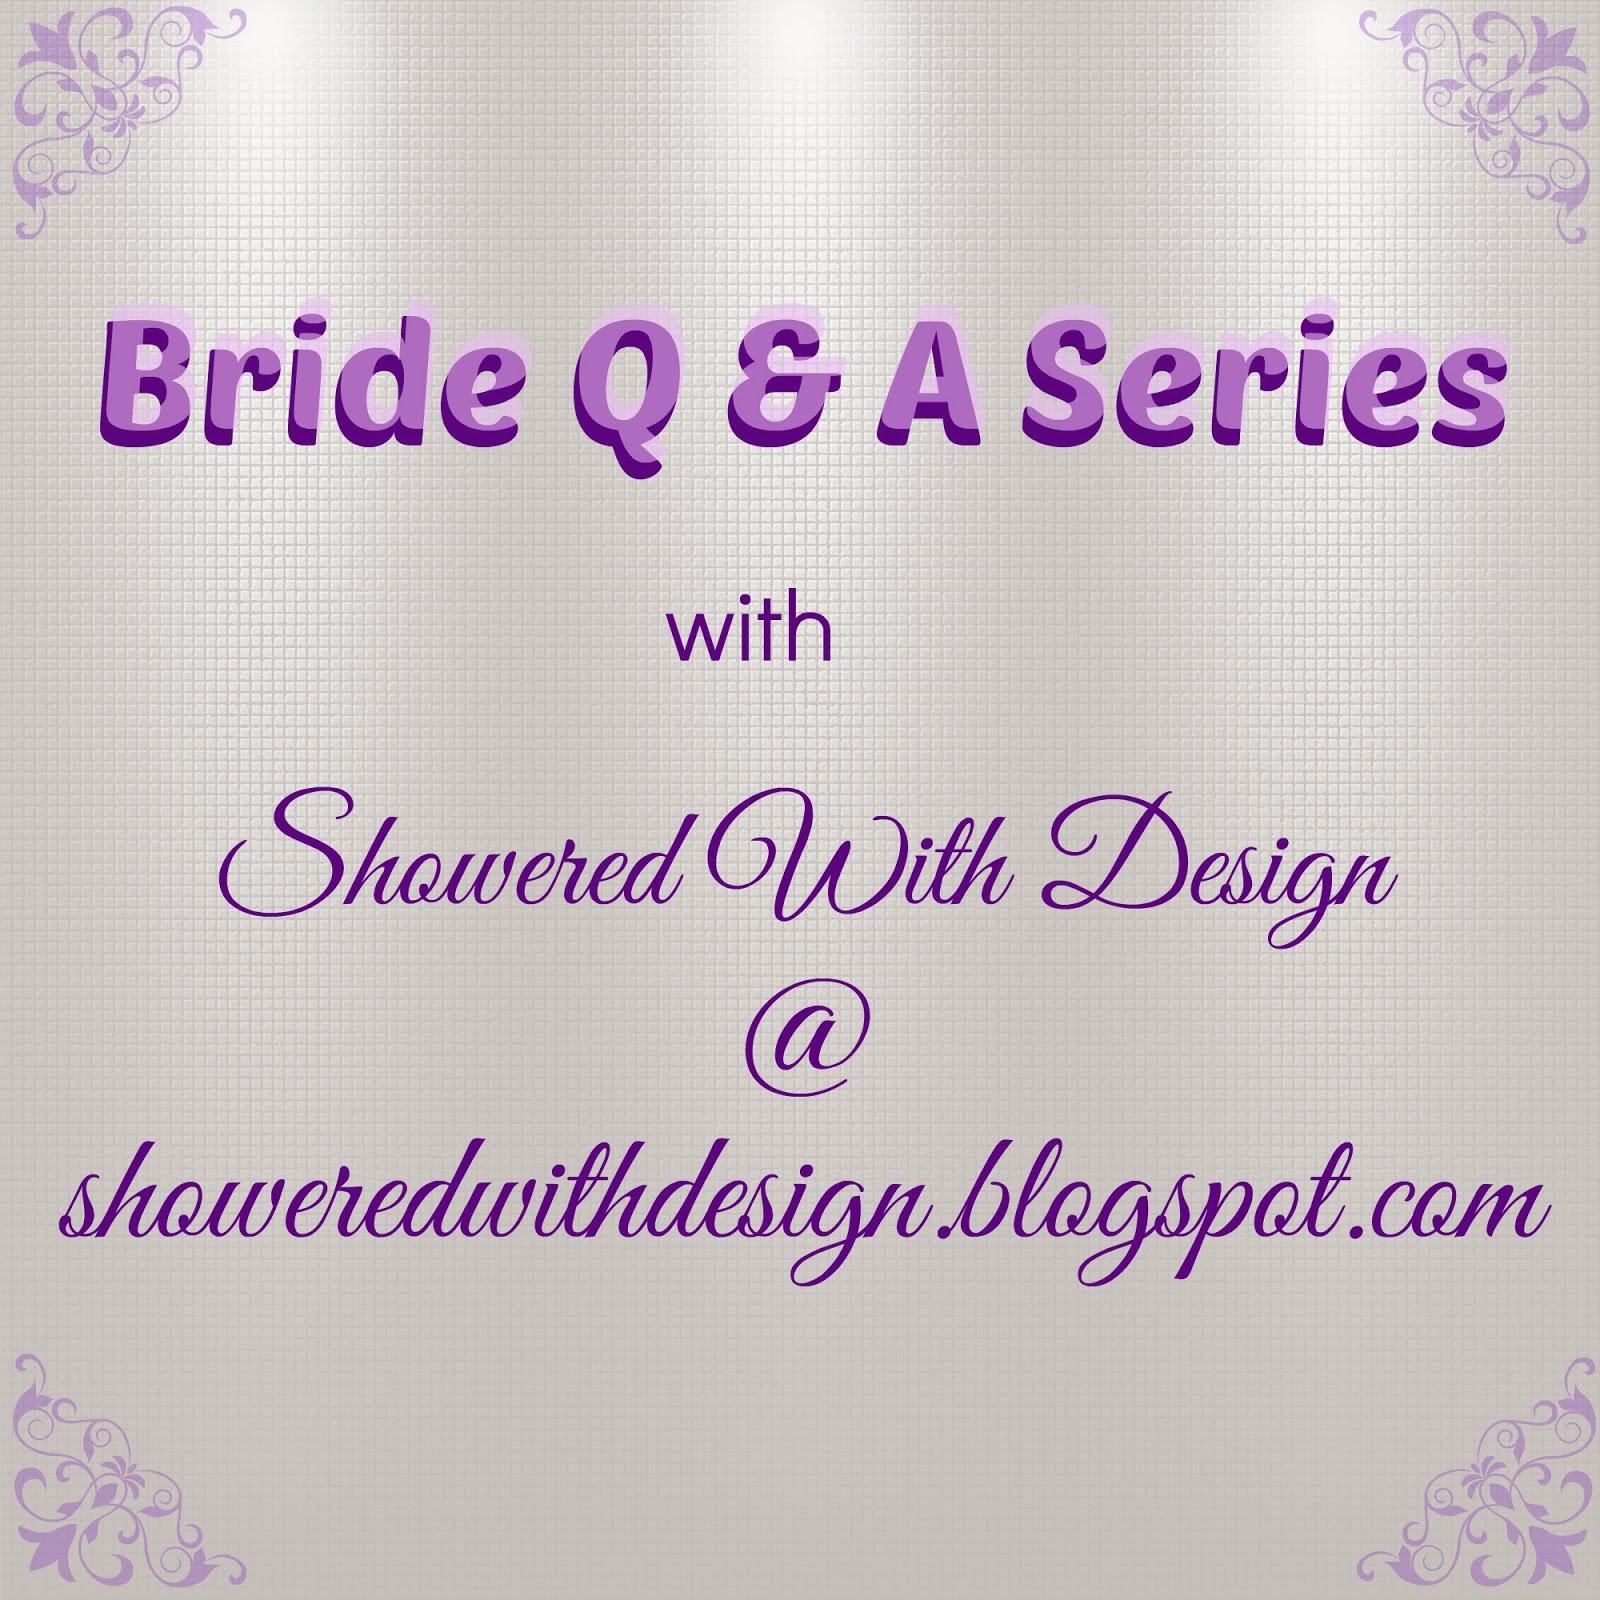 http://www.showeredwithdesign.blogspot.com/search/label/bride